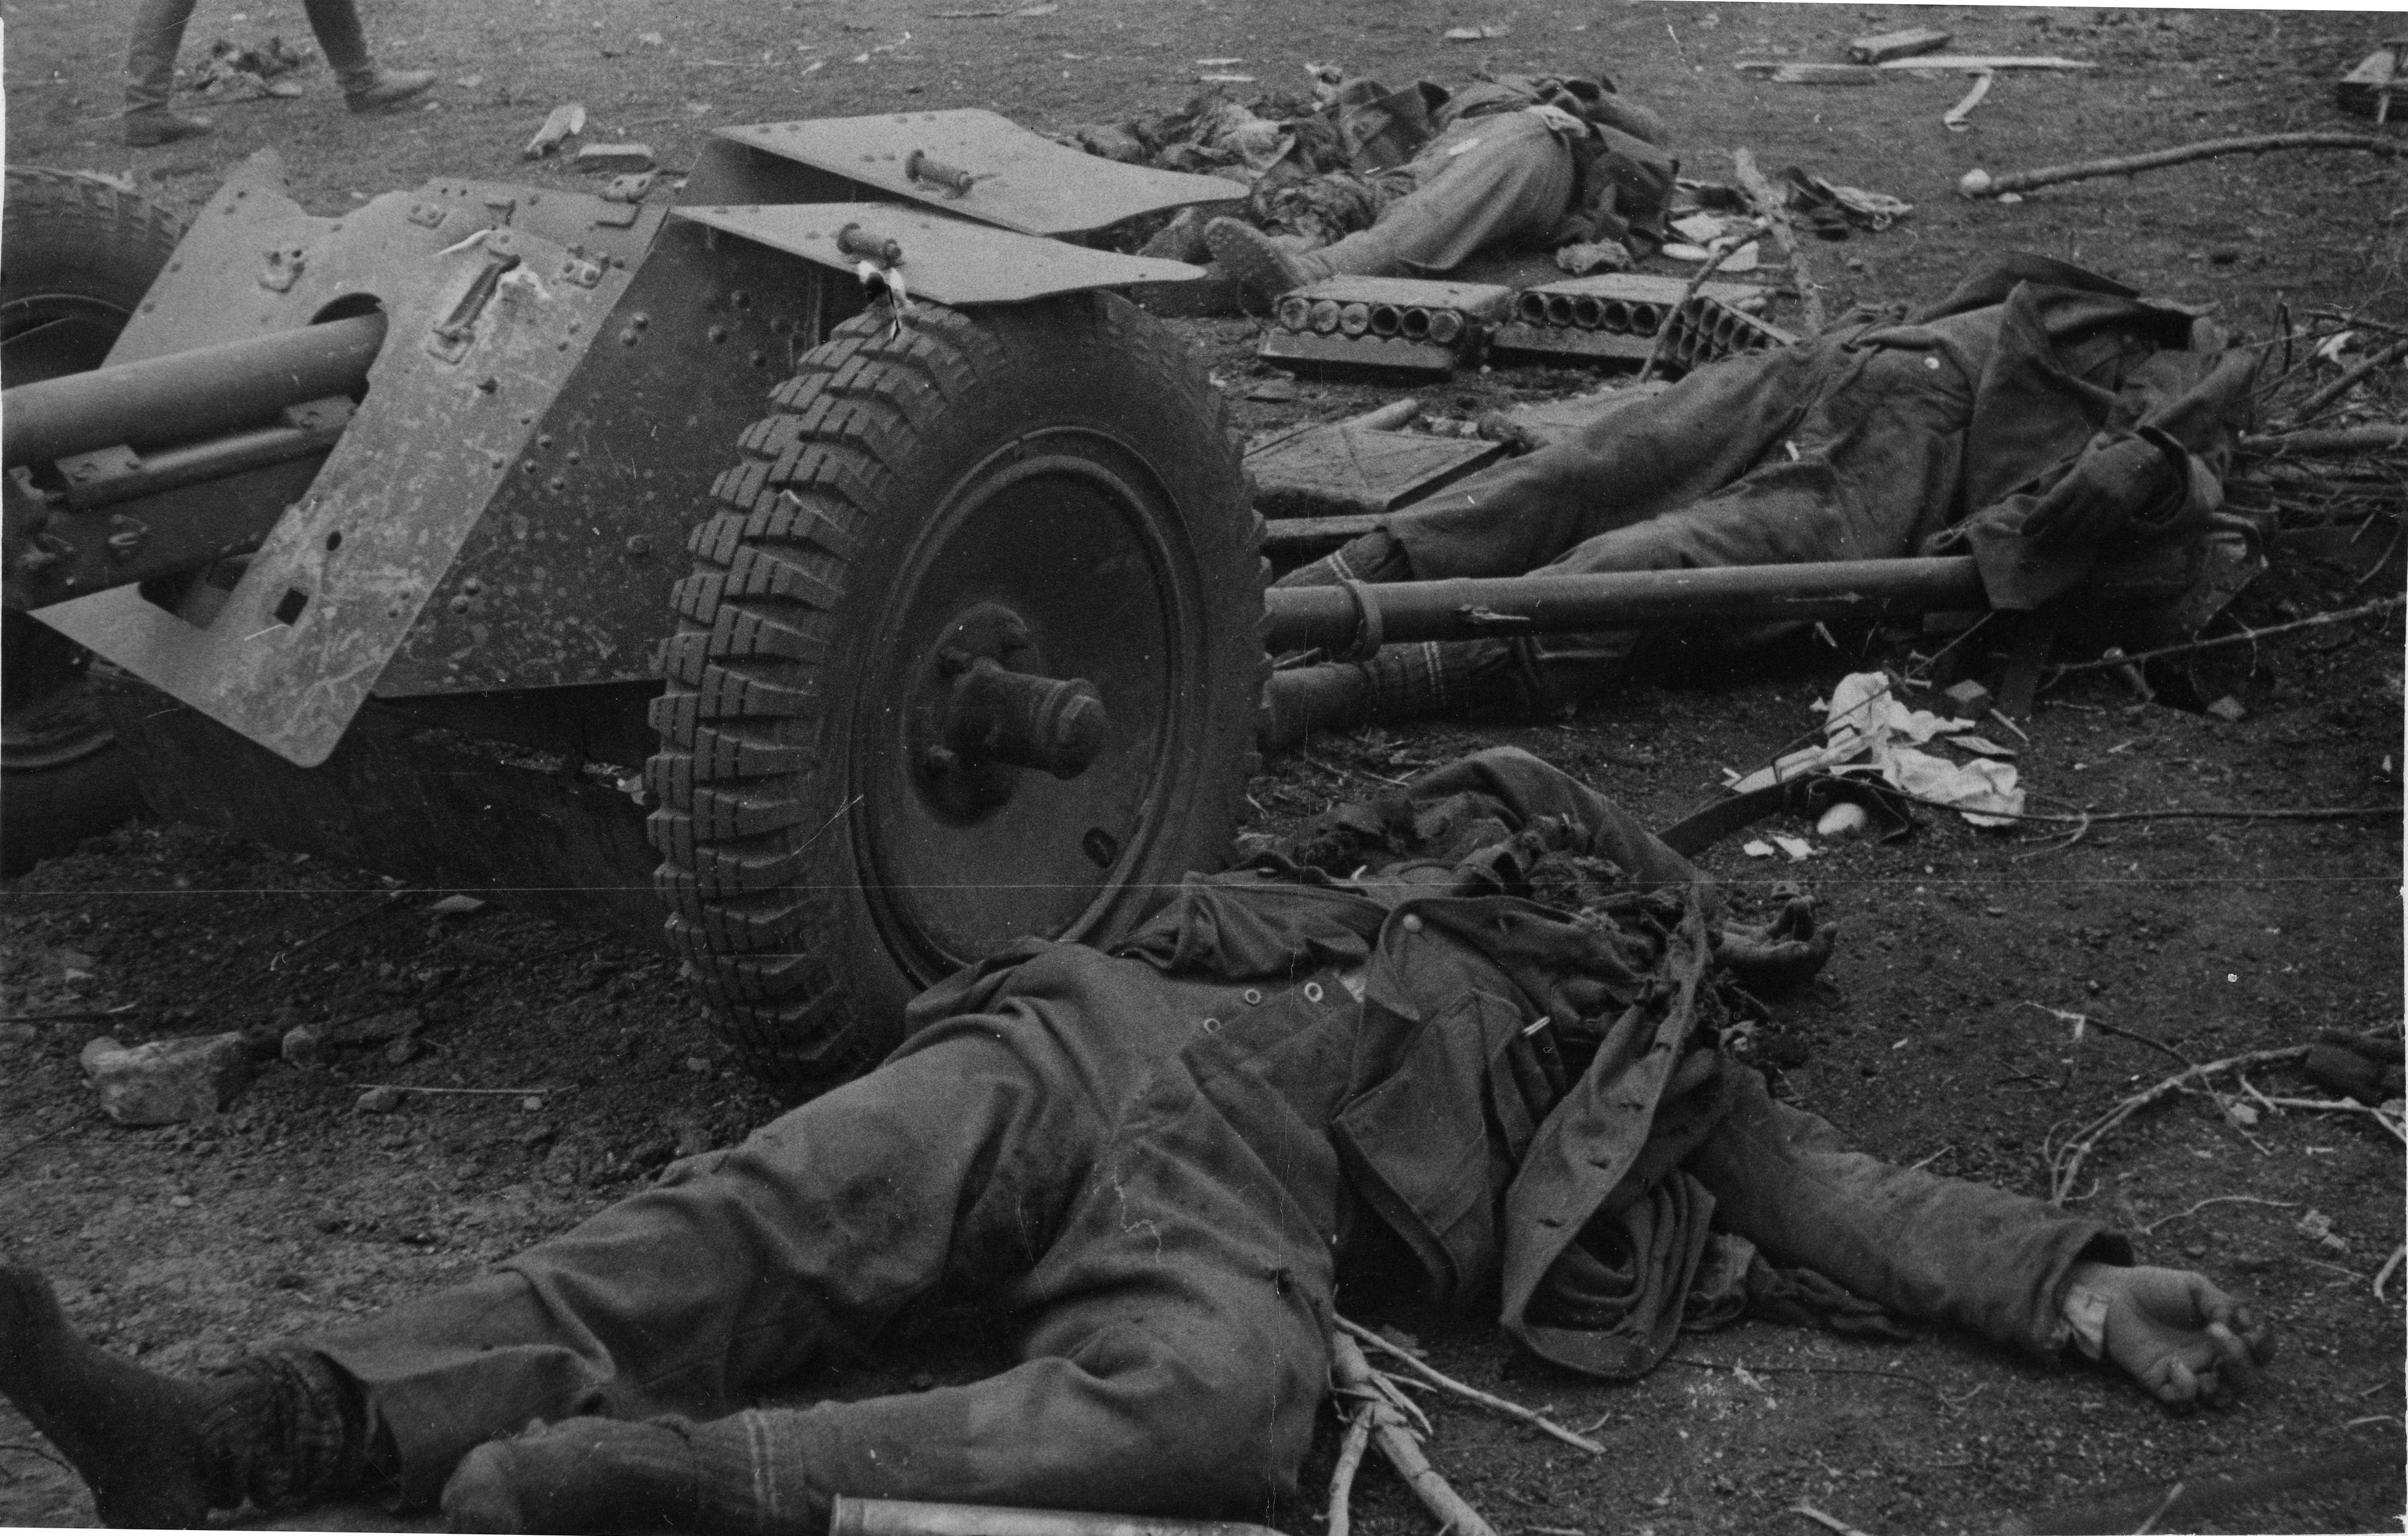 German 50 Mm Anti Tank Gun: The Crew Of The German 37mm Anti-tank Gun Have Been Killed